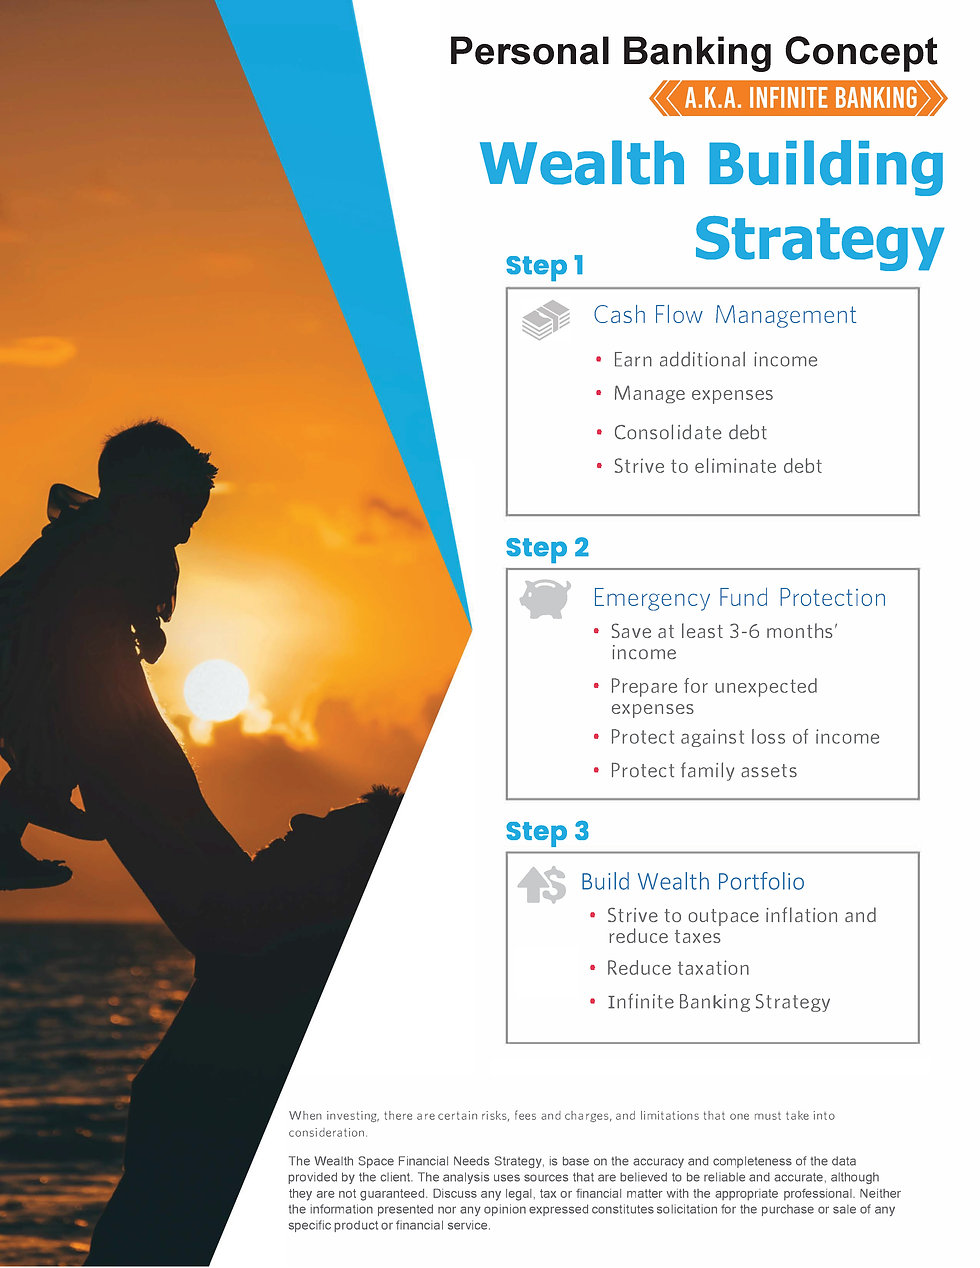 PBC - Wealth Building Strategy 4-1.jpg